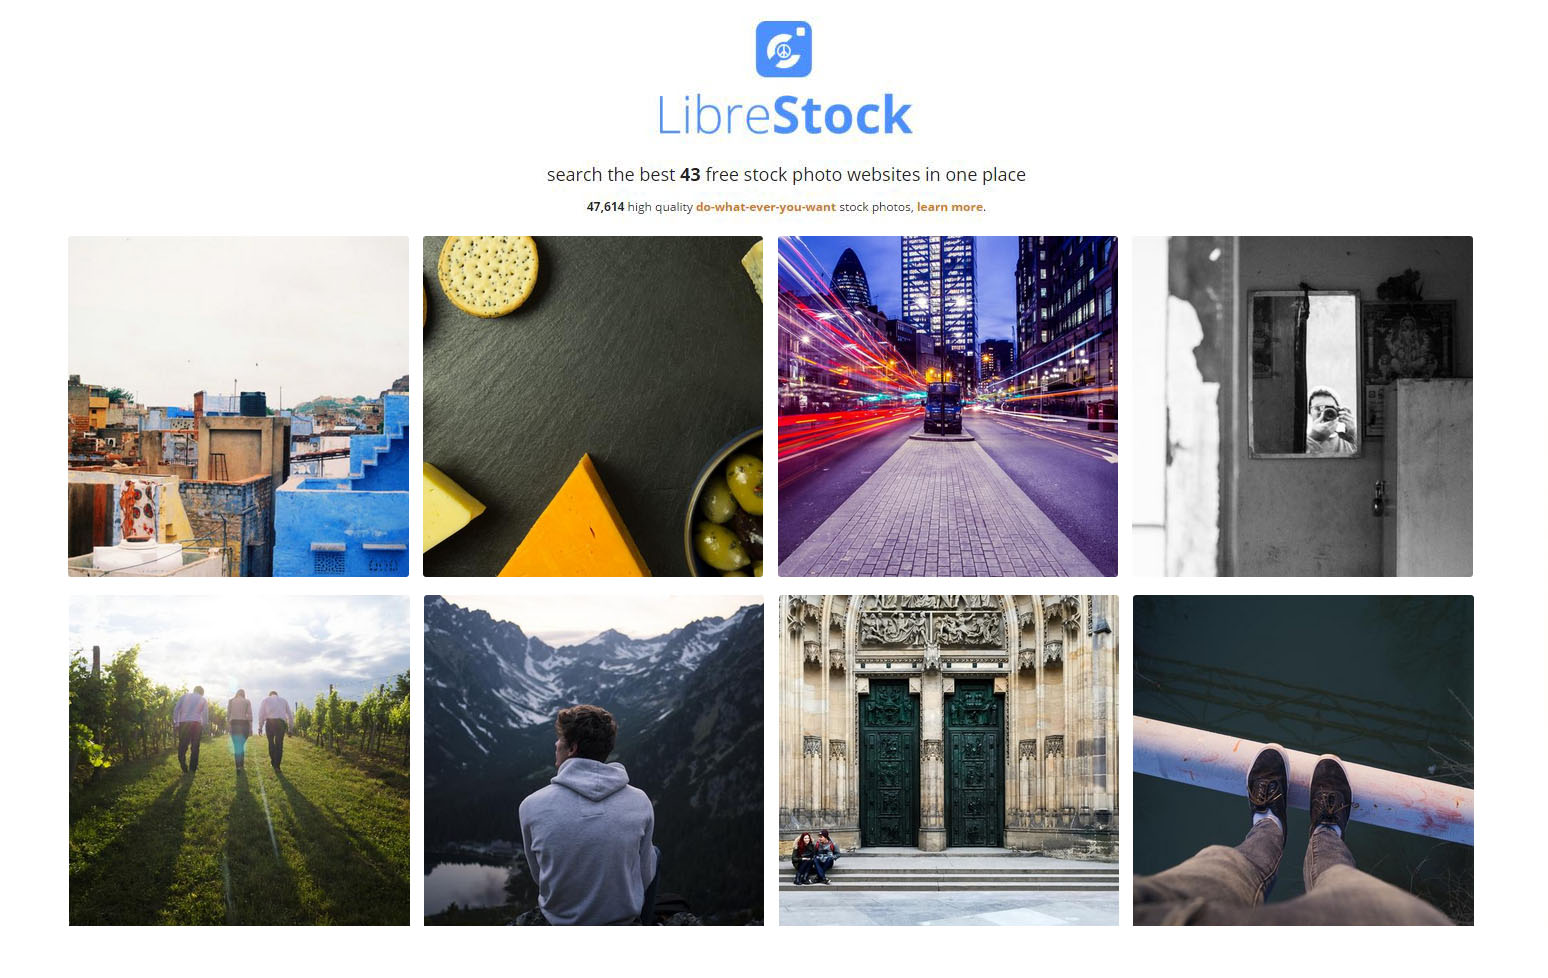 Librestock